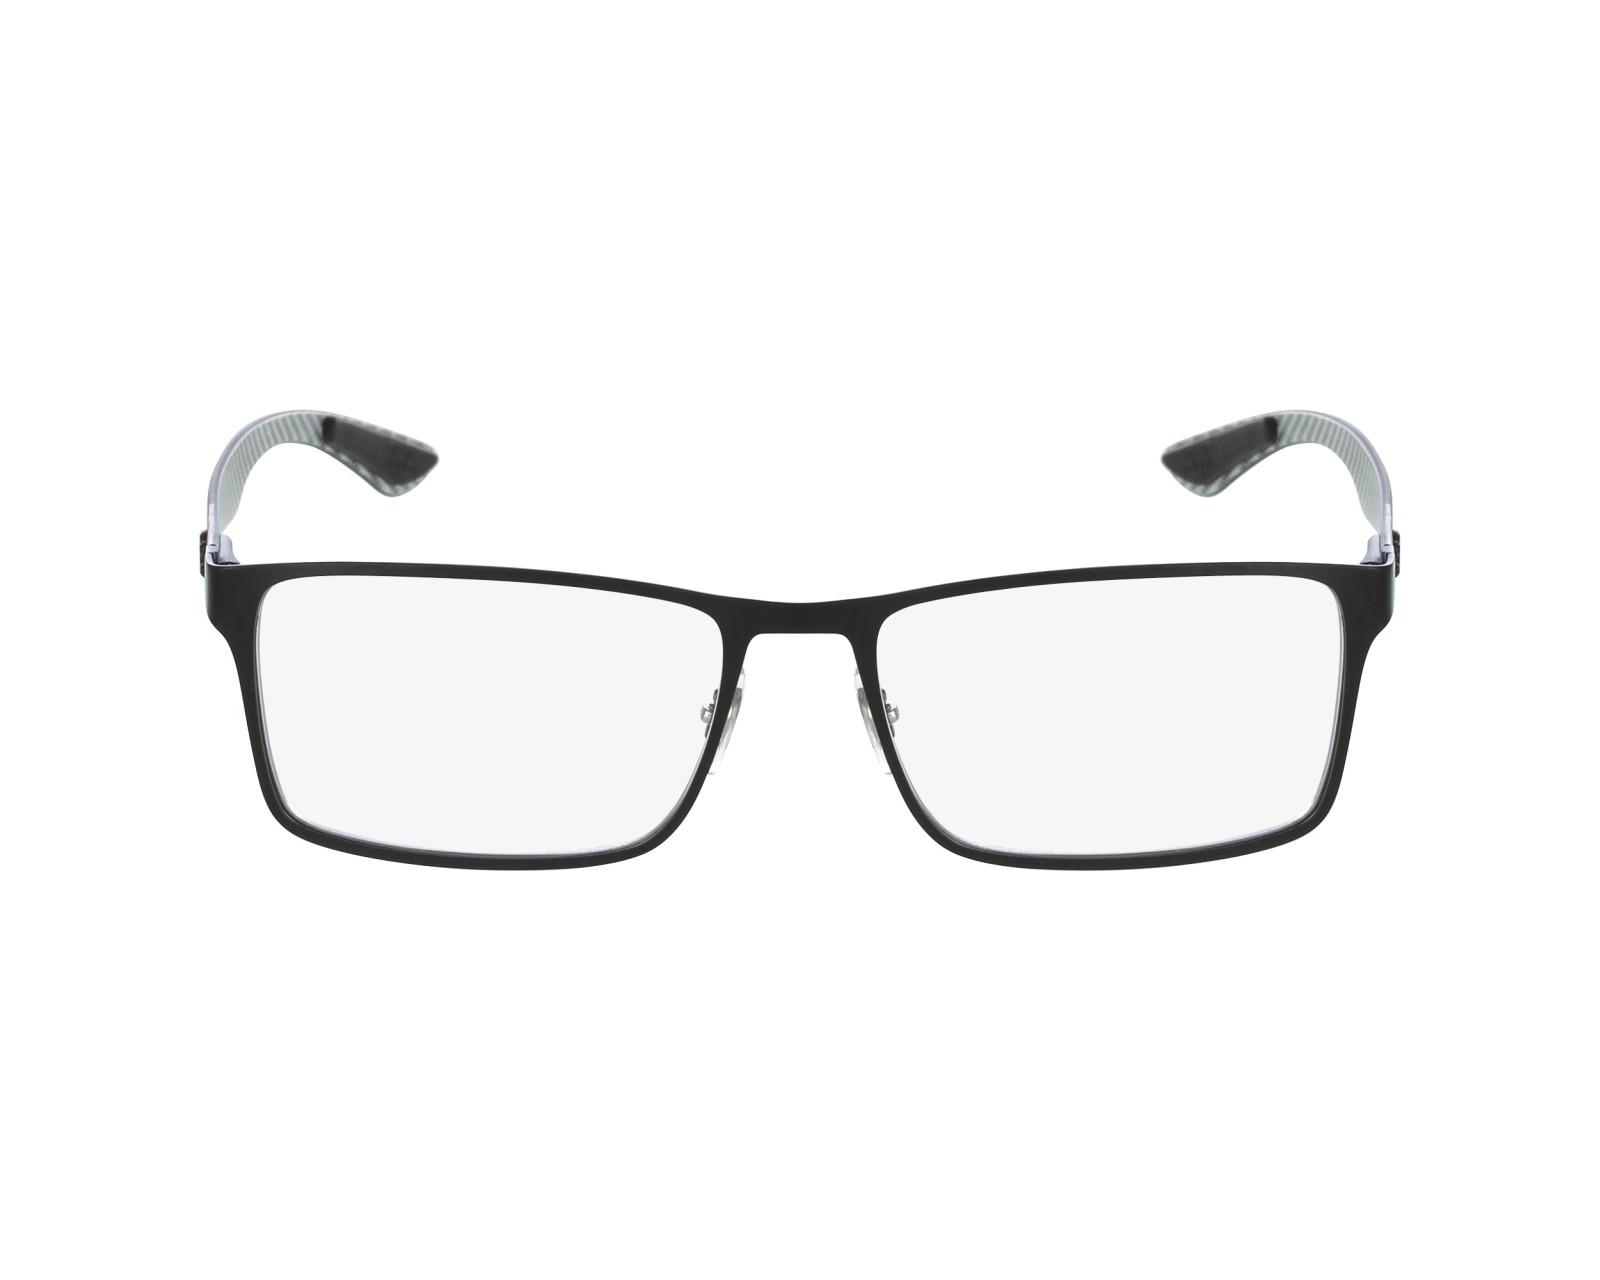 98cd842ec7 Brillen Ray-Ban RX-8415 2503 53-17 schwarz grau Profilansicht